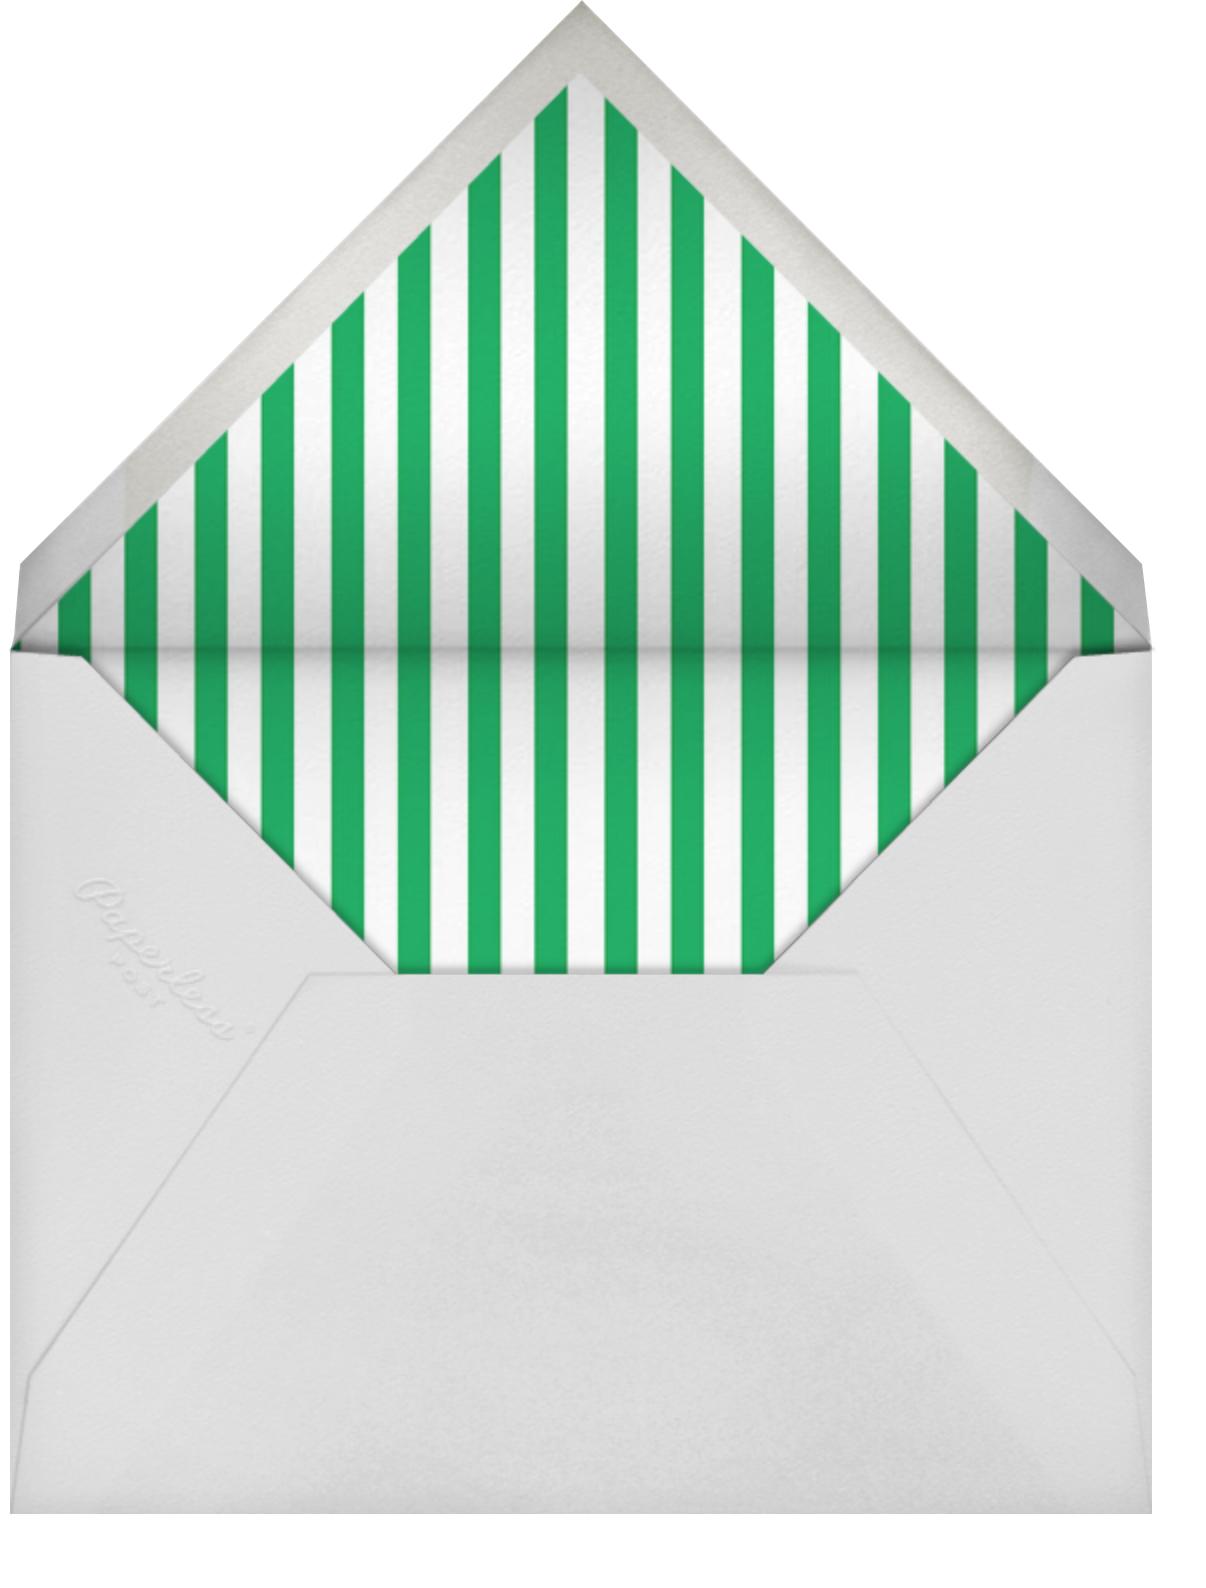 Pineapple Cake - Wisteria/Tan - Mr. Boddington's Studio - Kids' birthday - envelope back